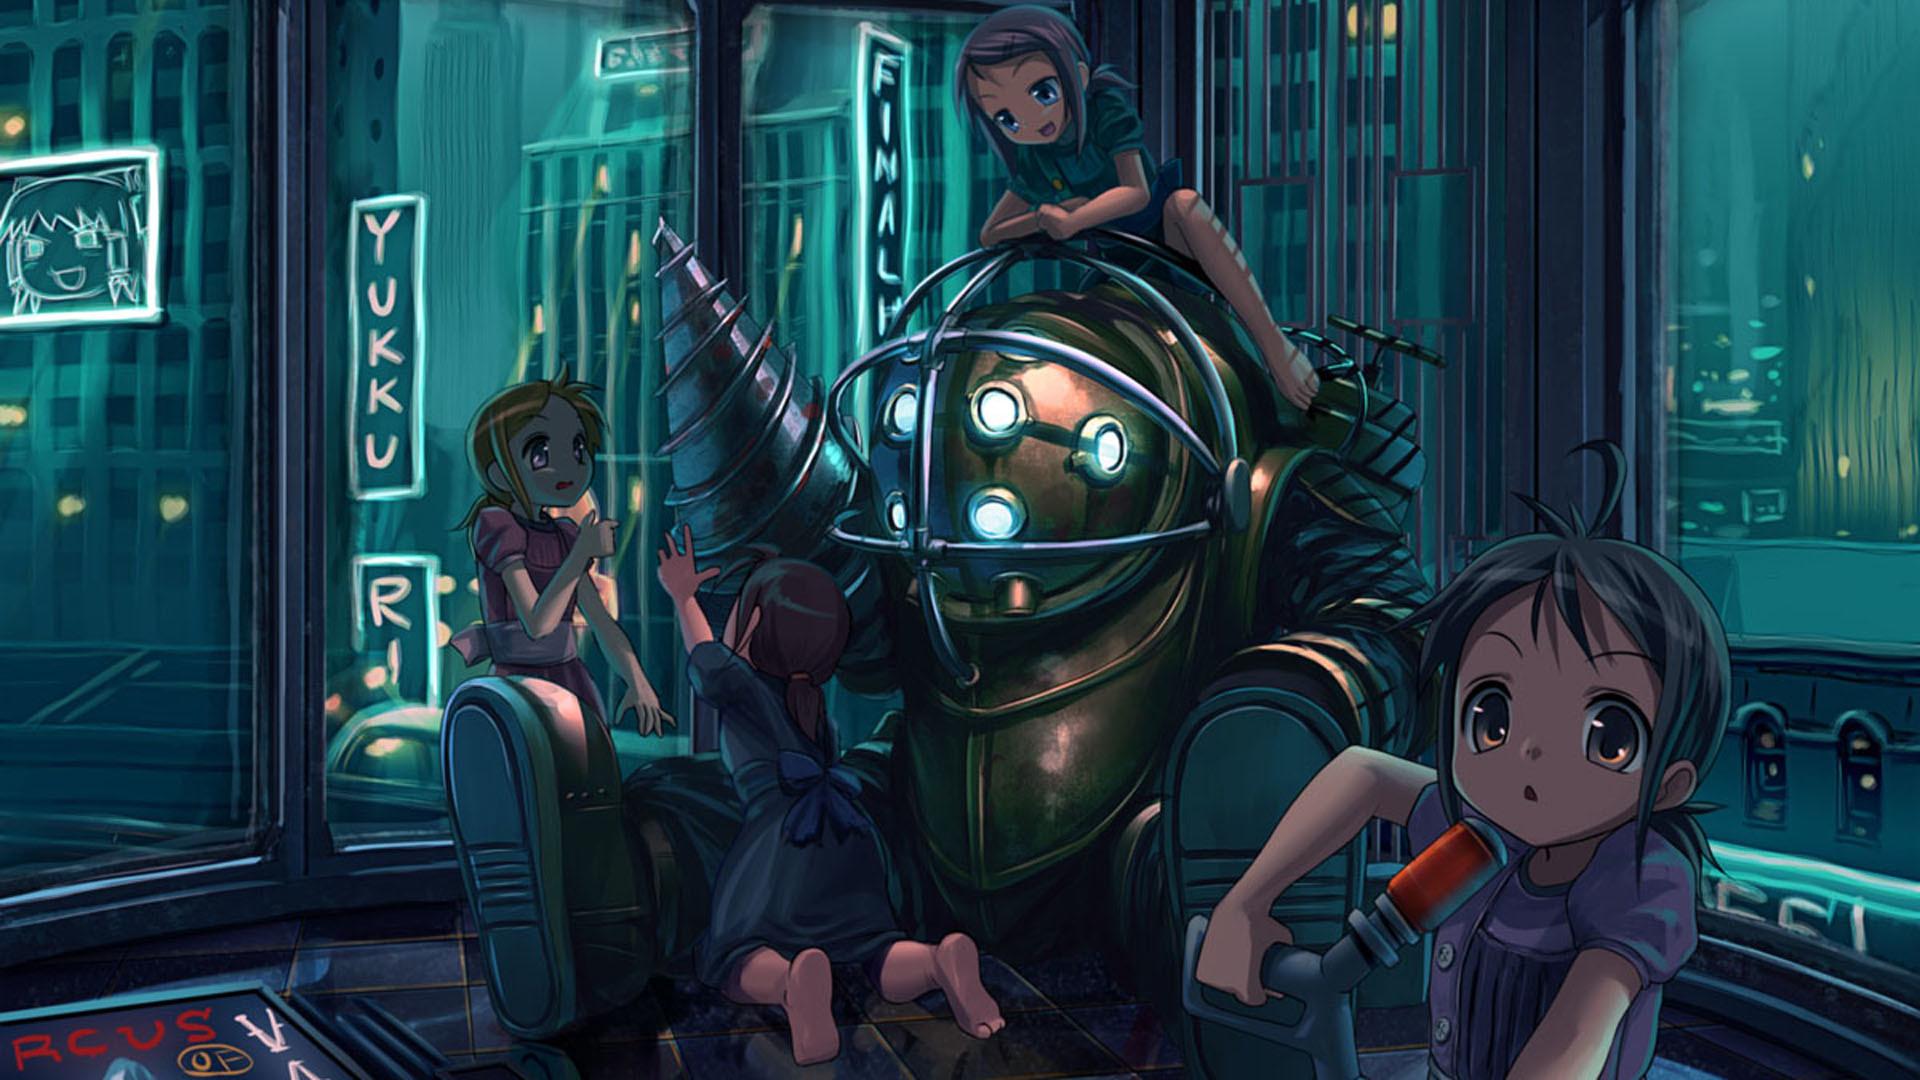 Big Daddy Wallpaper Big, Daddy, Little, Sister, BioShock .